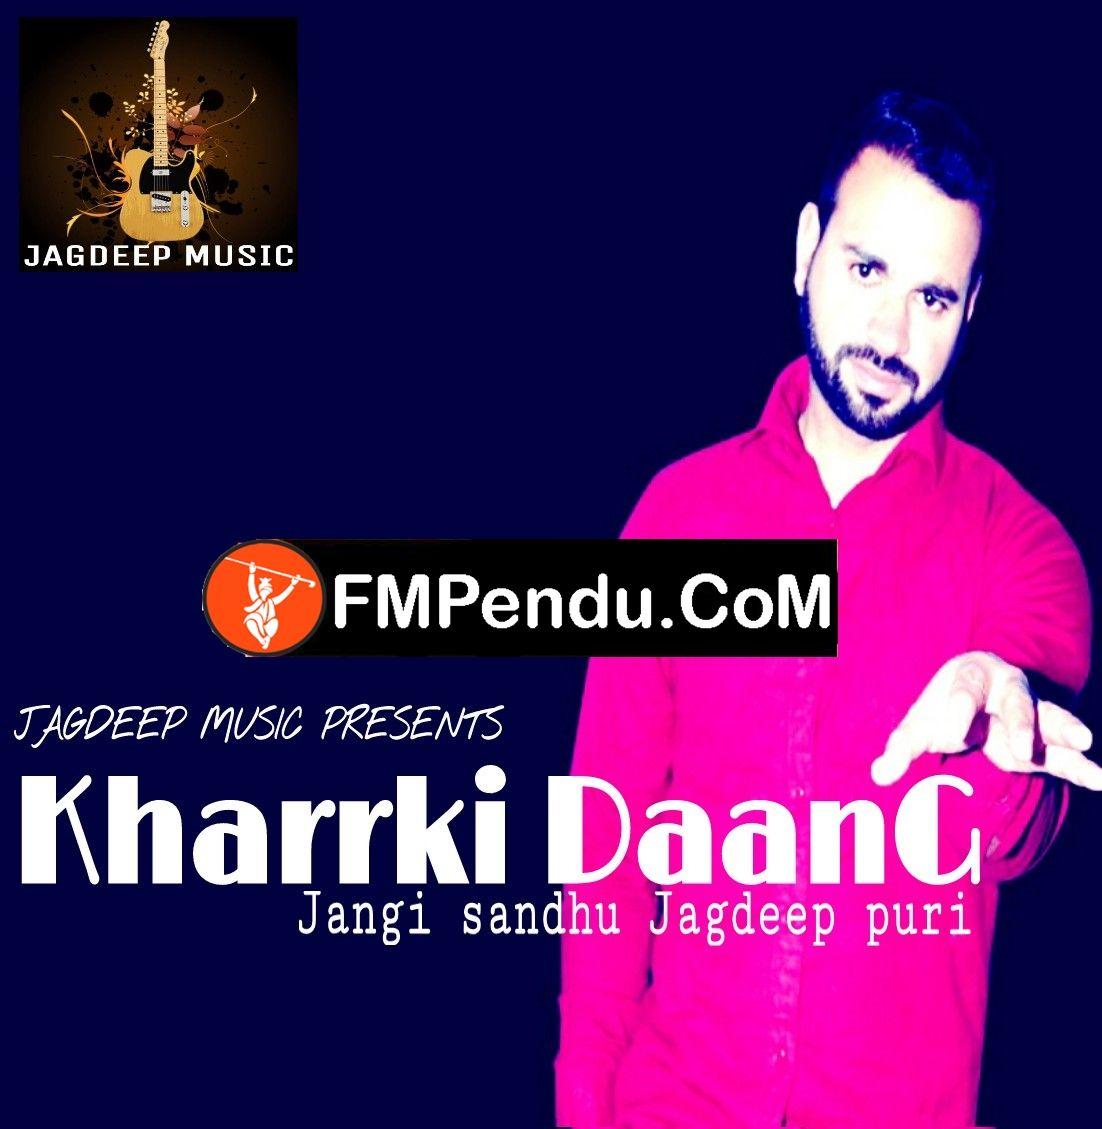 Kharrki Daang Jangi Sandhu Latest Mp3 Song Lyrics Ringtone Mp3 Song Songs Mp3 Song Download